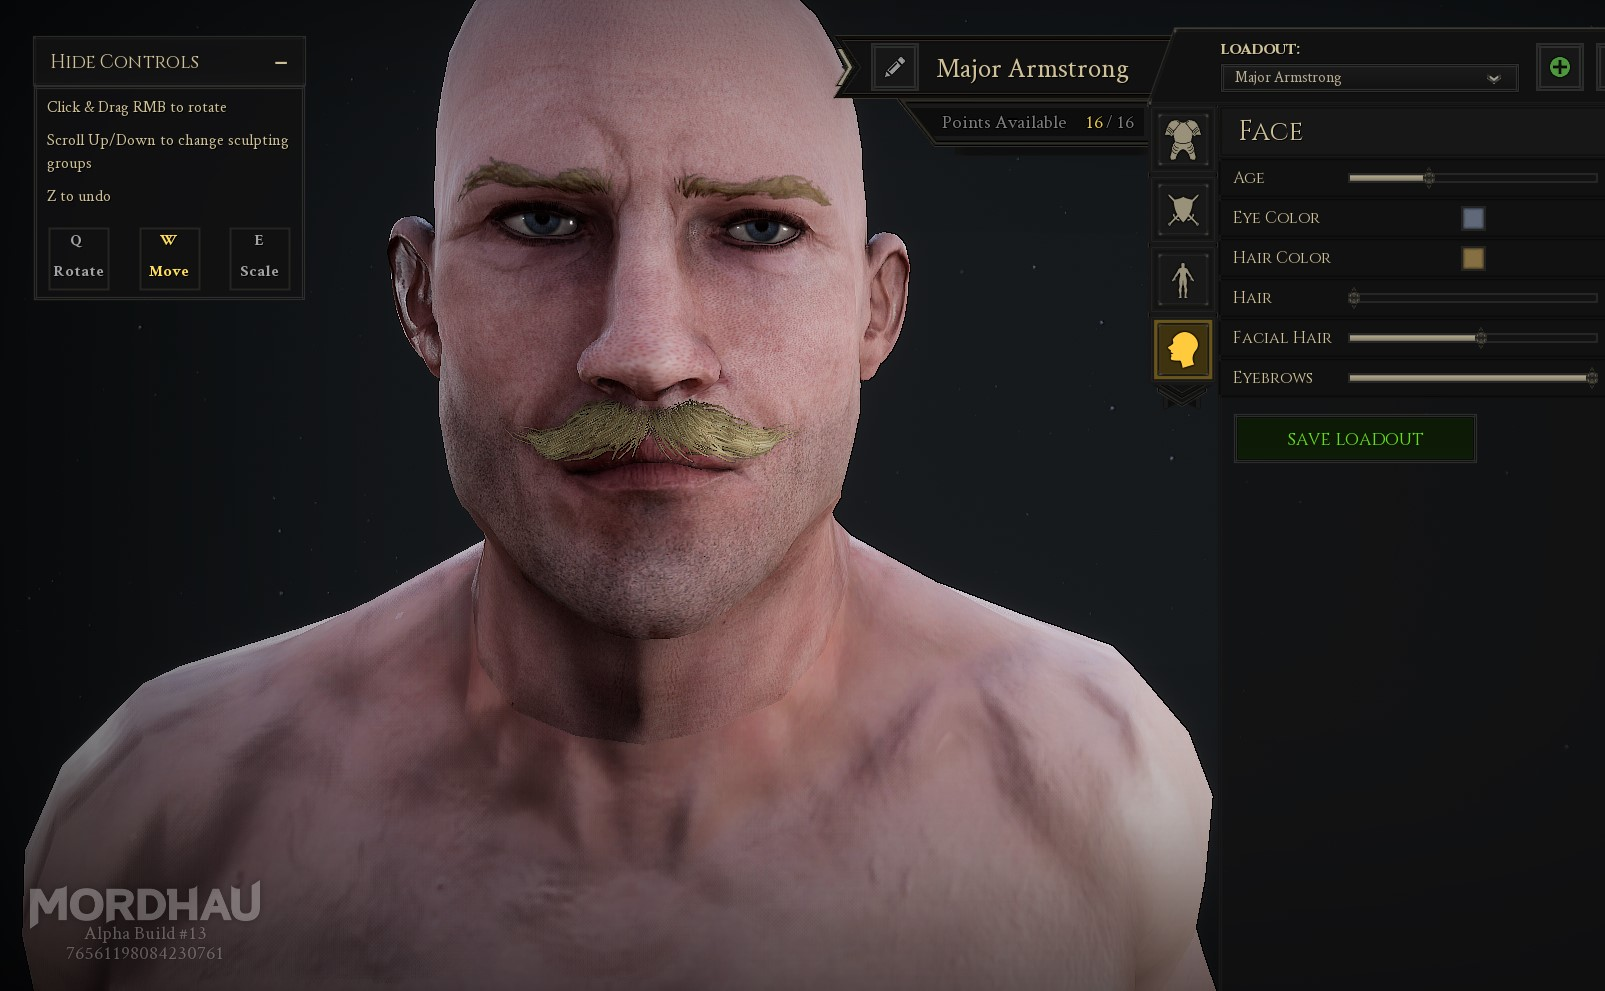 major as face.jpg